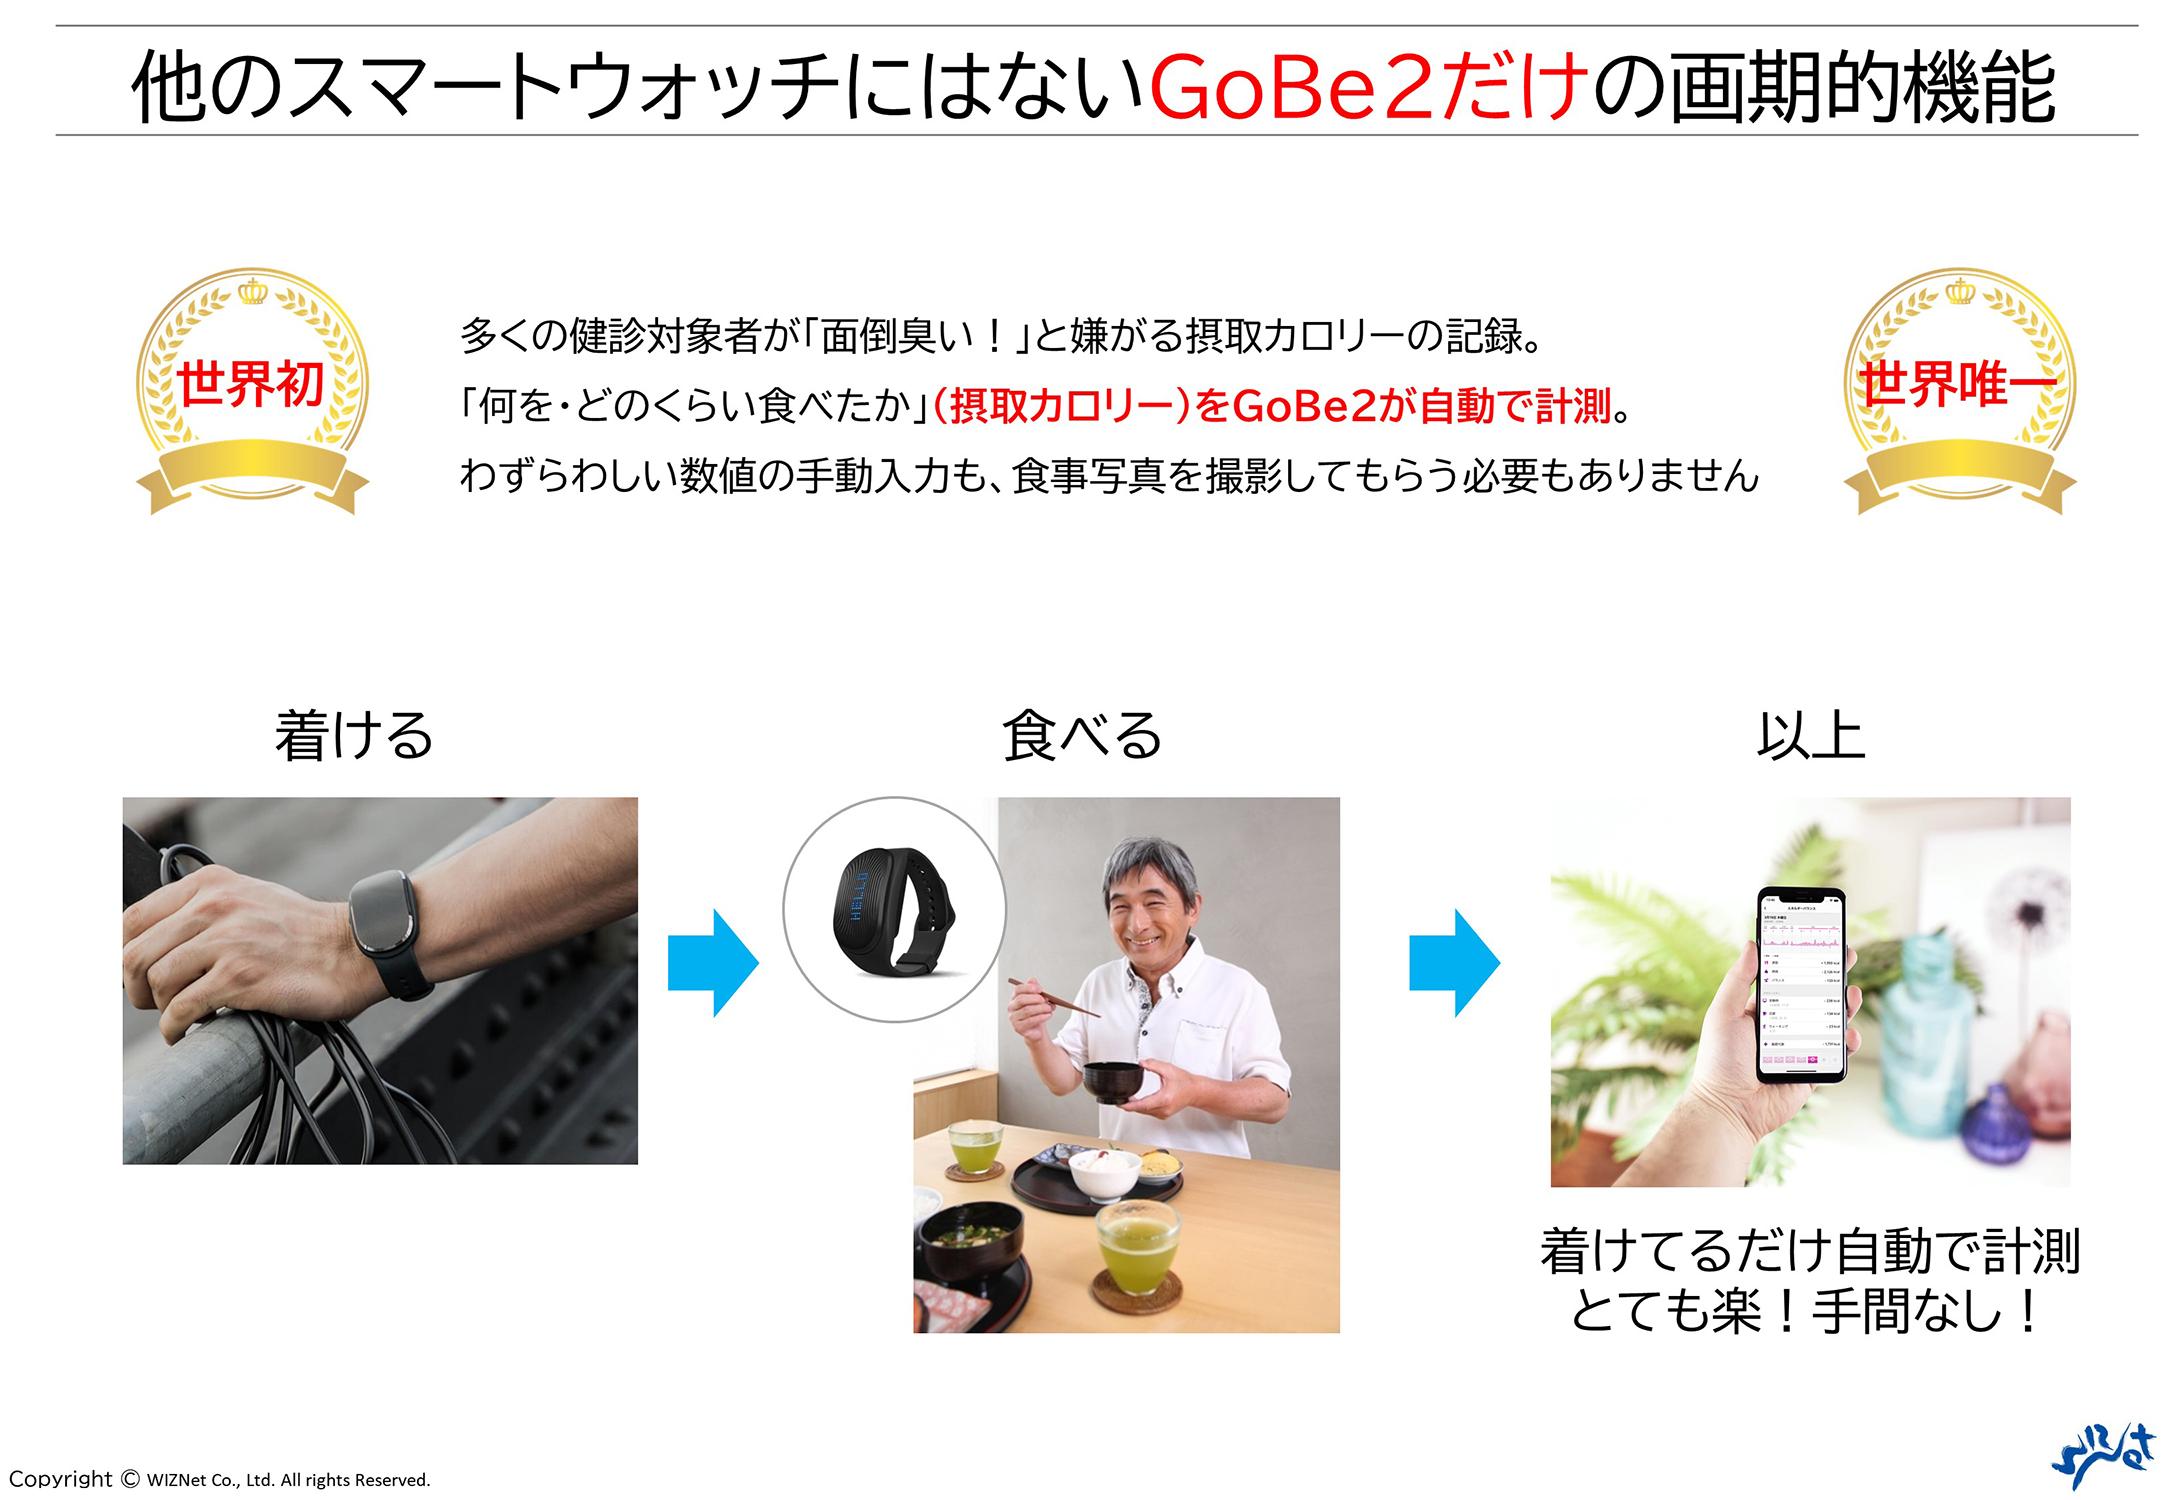 GoBe2なら、腕につけておくだけ!以上